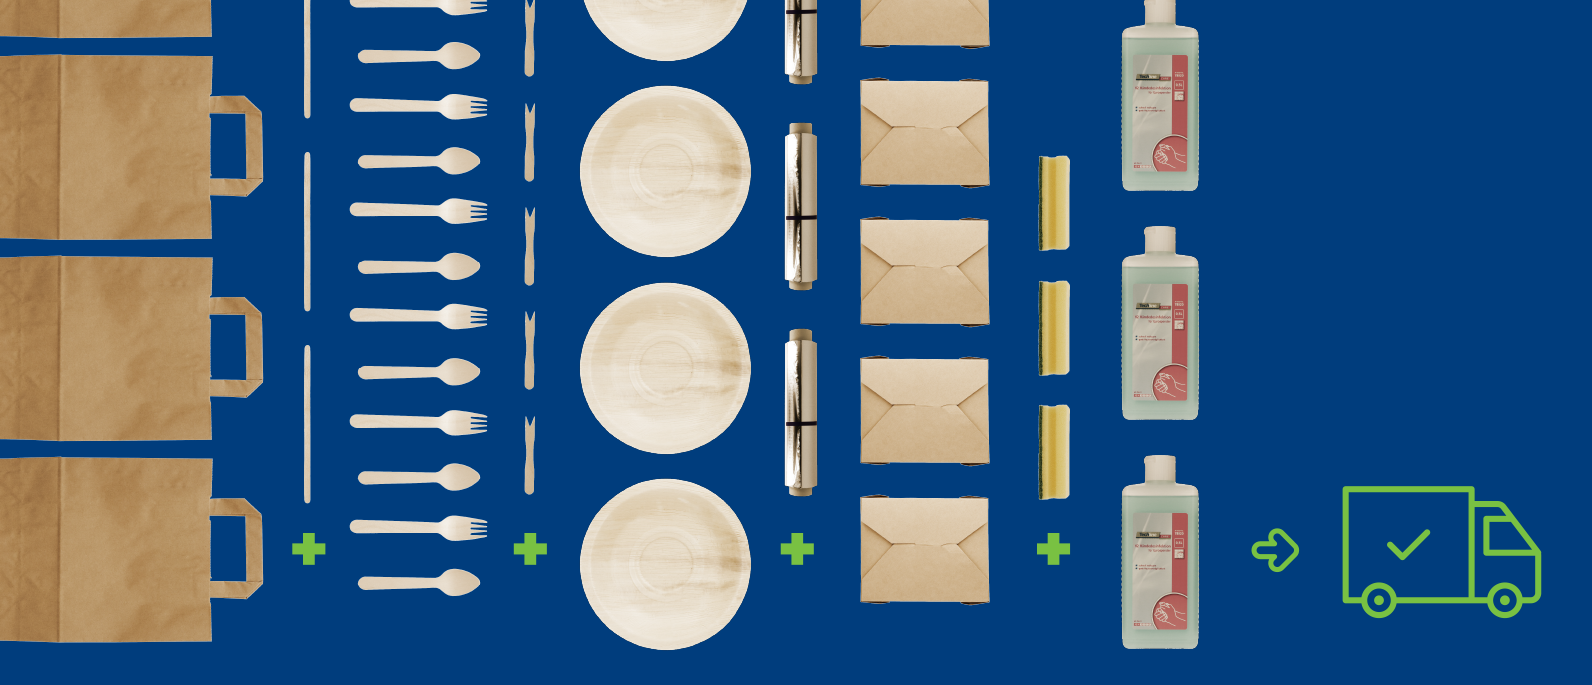 Papiertragetaschen, Rührstäbchen, Pommesgabel, Birkenholzbesteck, Palmblattteller, Alufolie, Menüboxen, Spülschwämme, Handdesinfektionsmittel